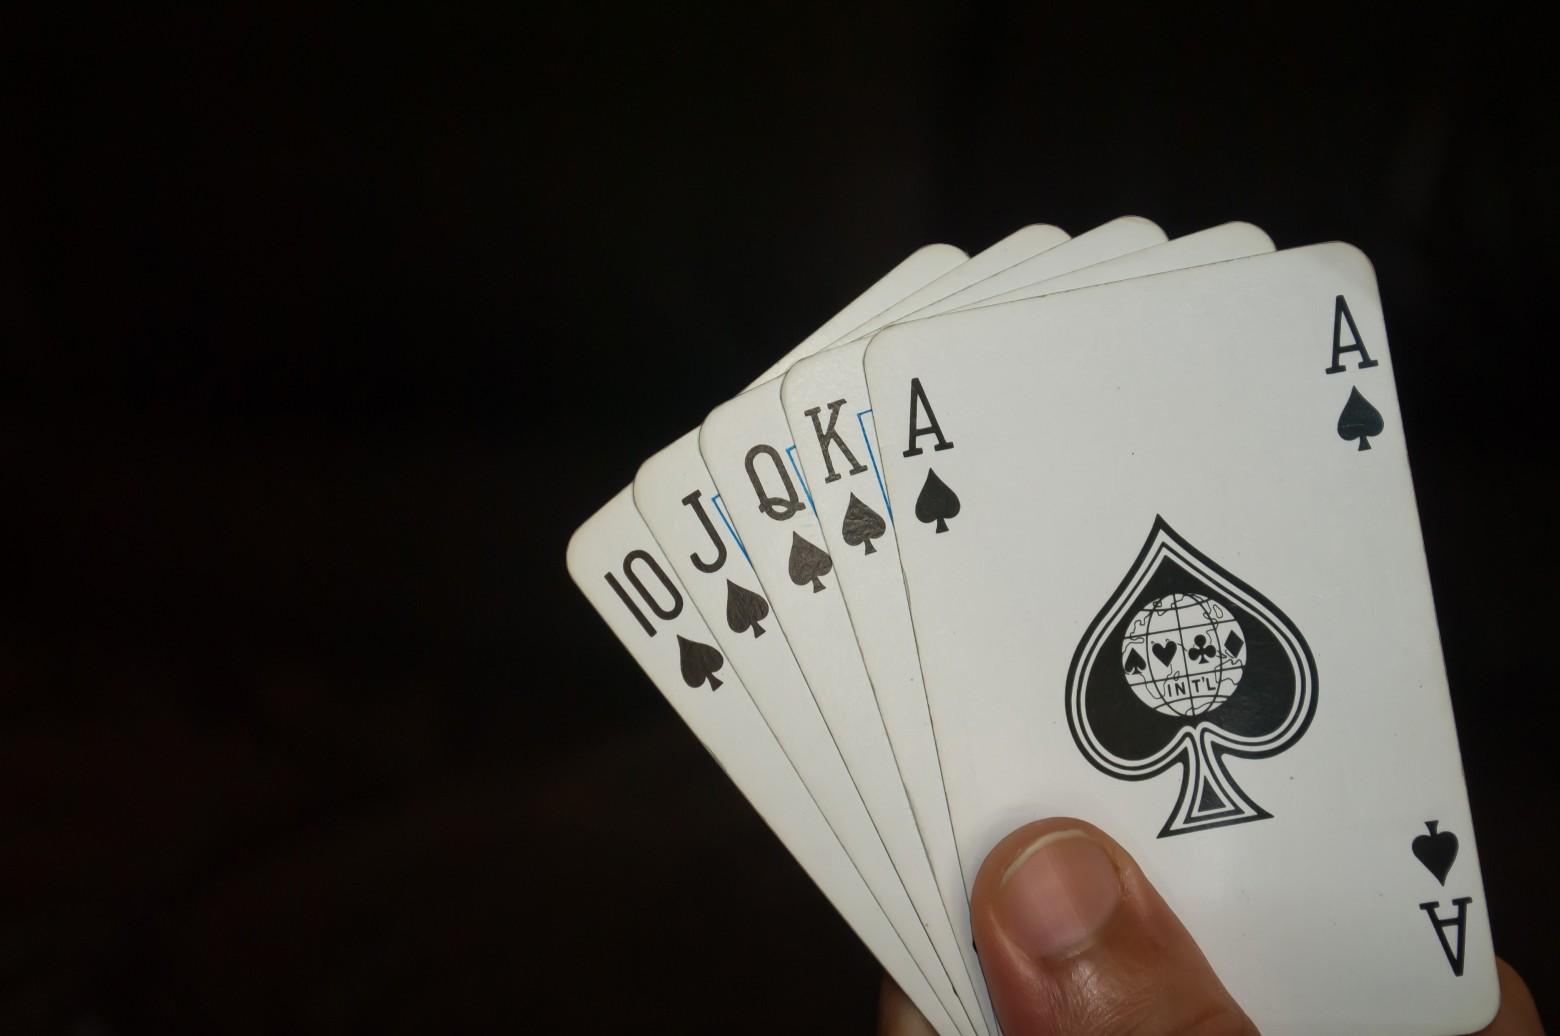 imagescarte-casino-90.jpg